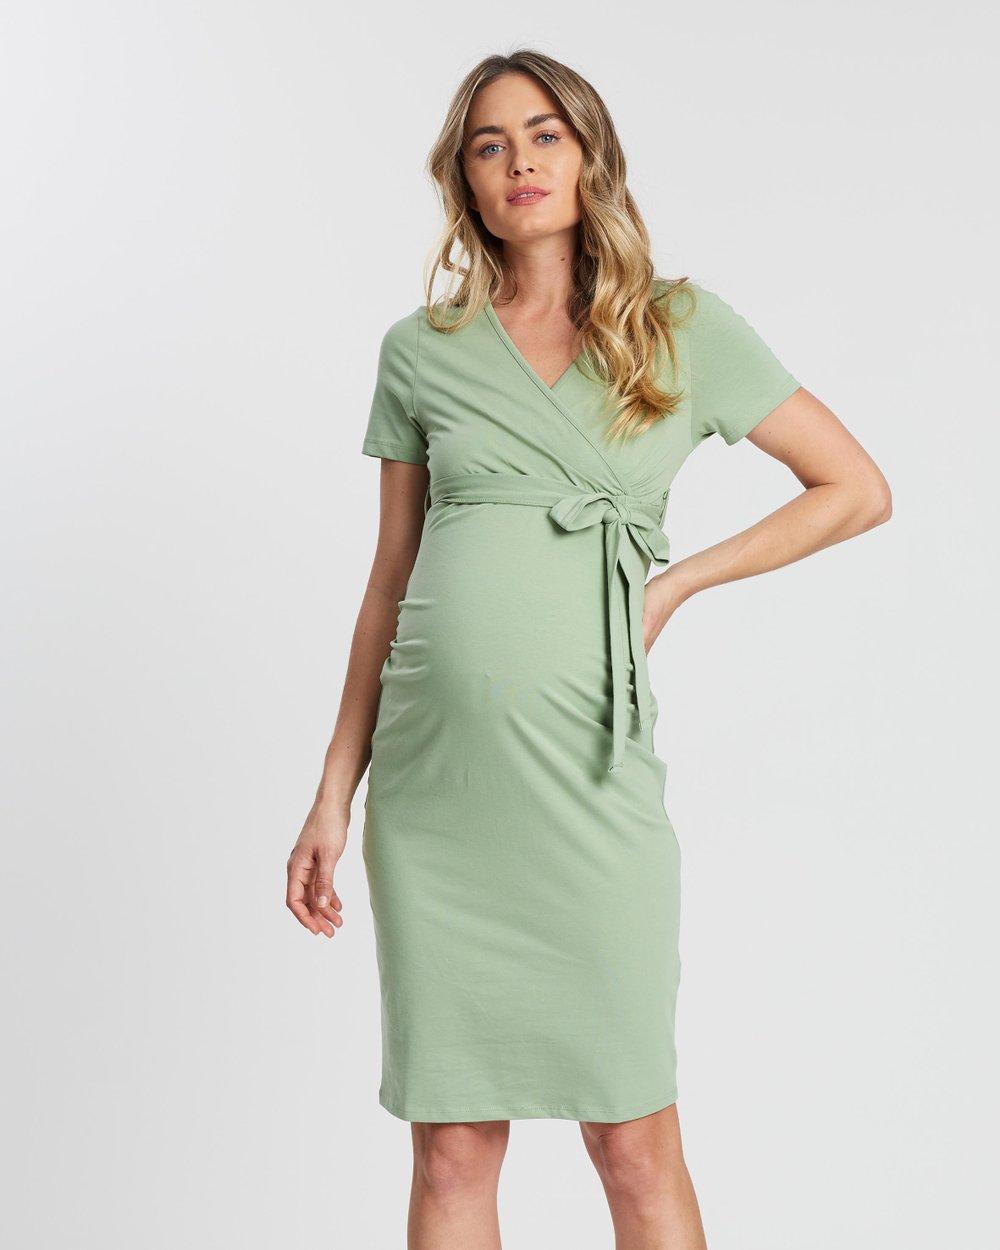 c298b0de54285 Sage Ruched Wrap Dress by DP Maternity Online   THE ICONIC   Australia